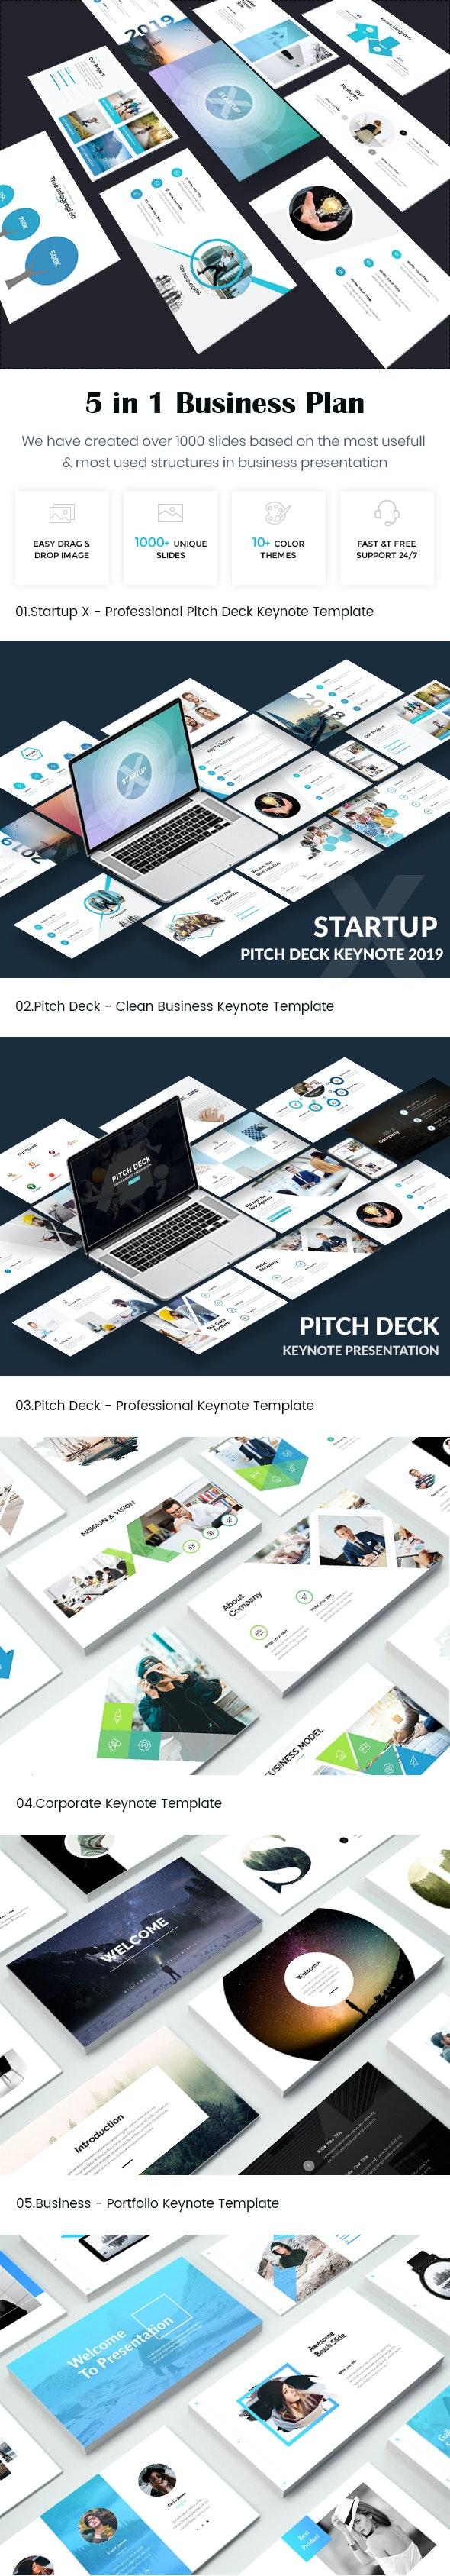 Bundle 5 in 1 Business Plan Keynote Template 2019 - Business Keynote Templates